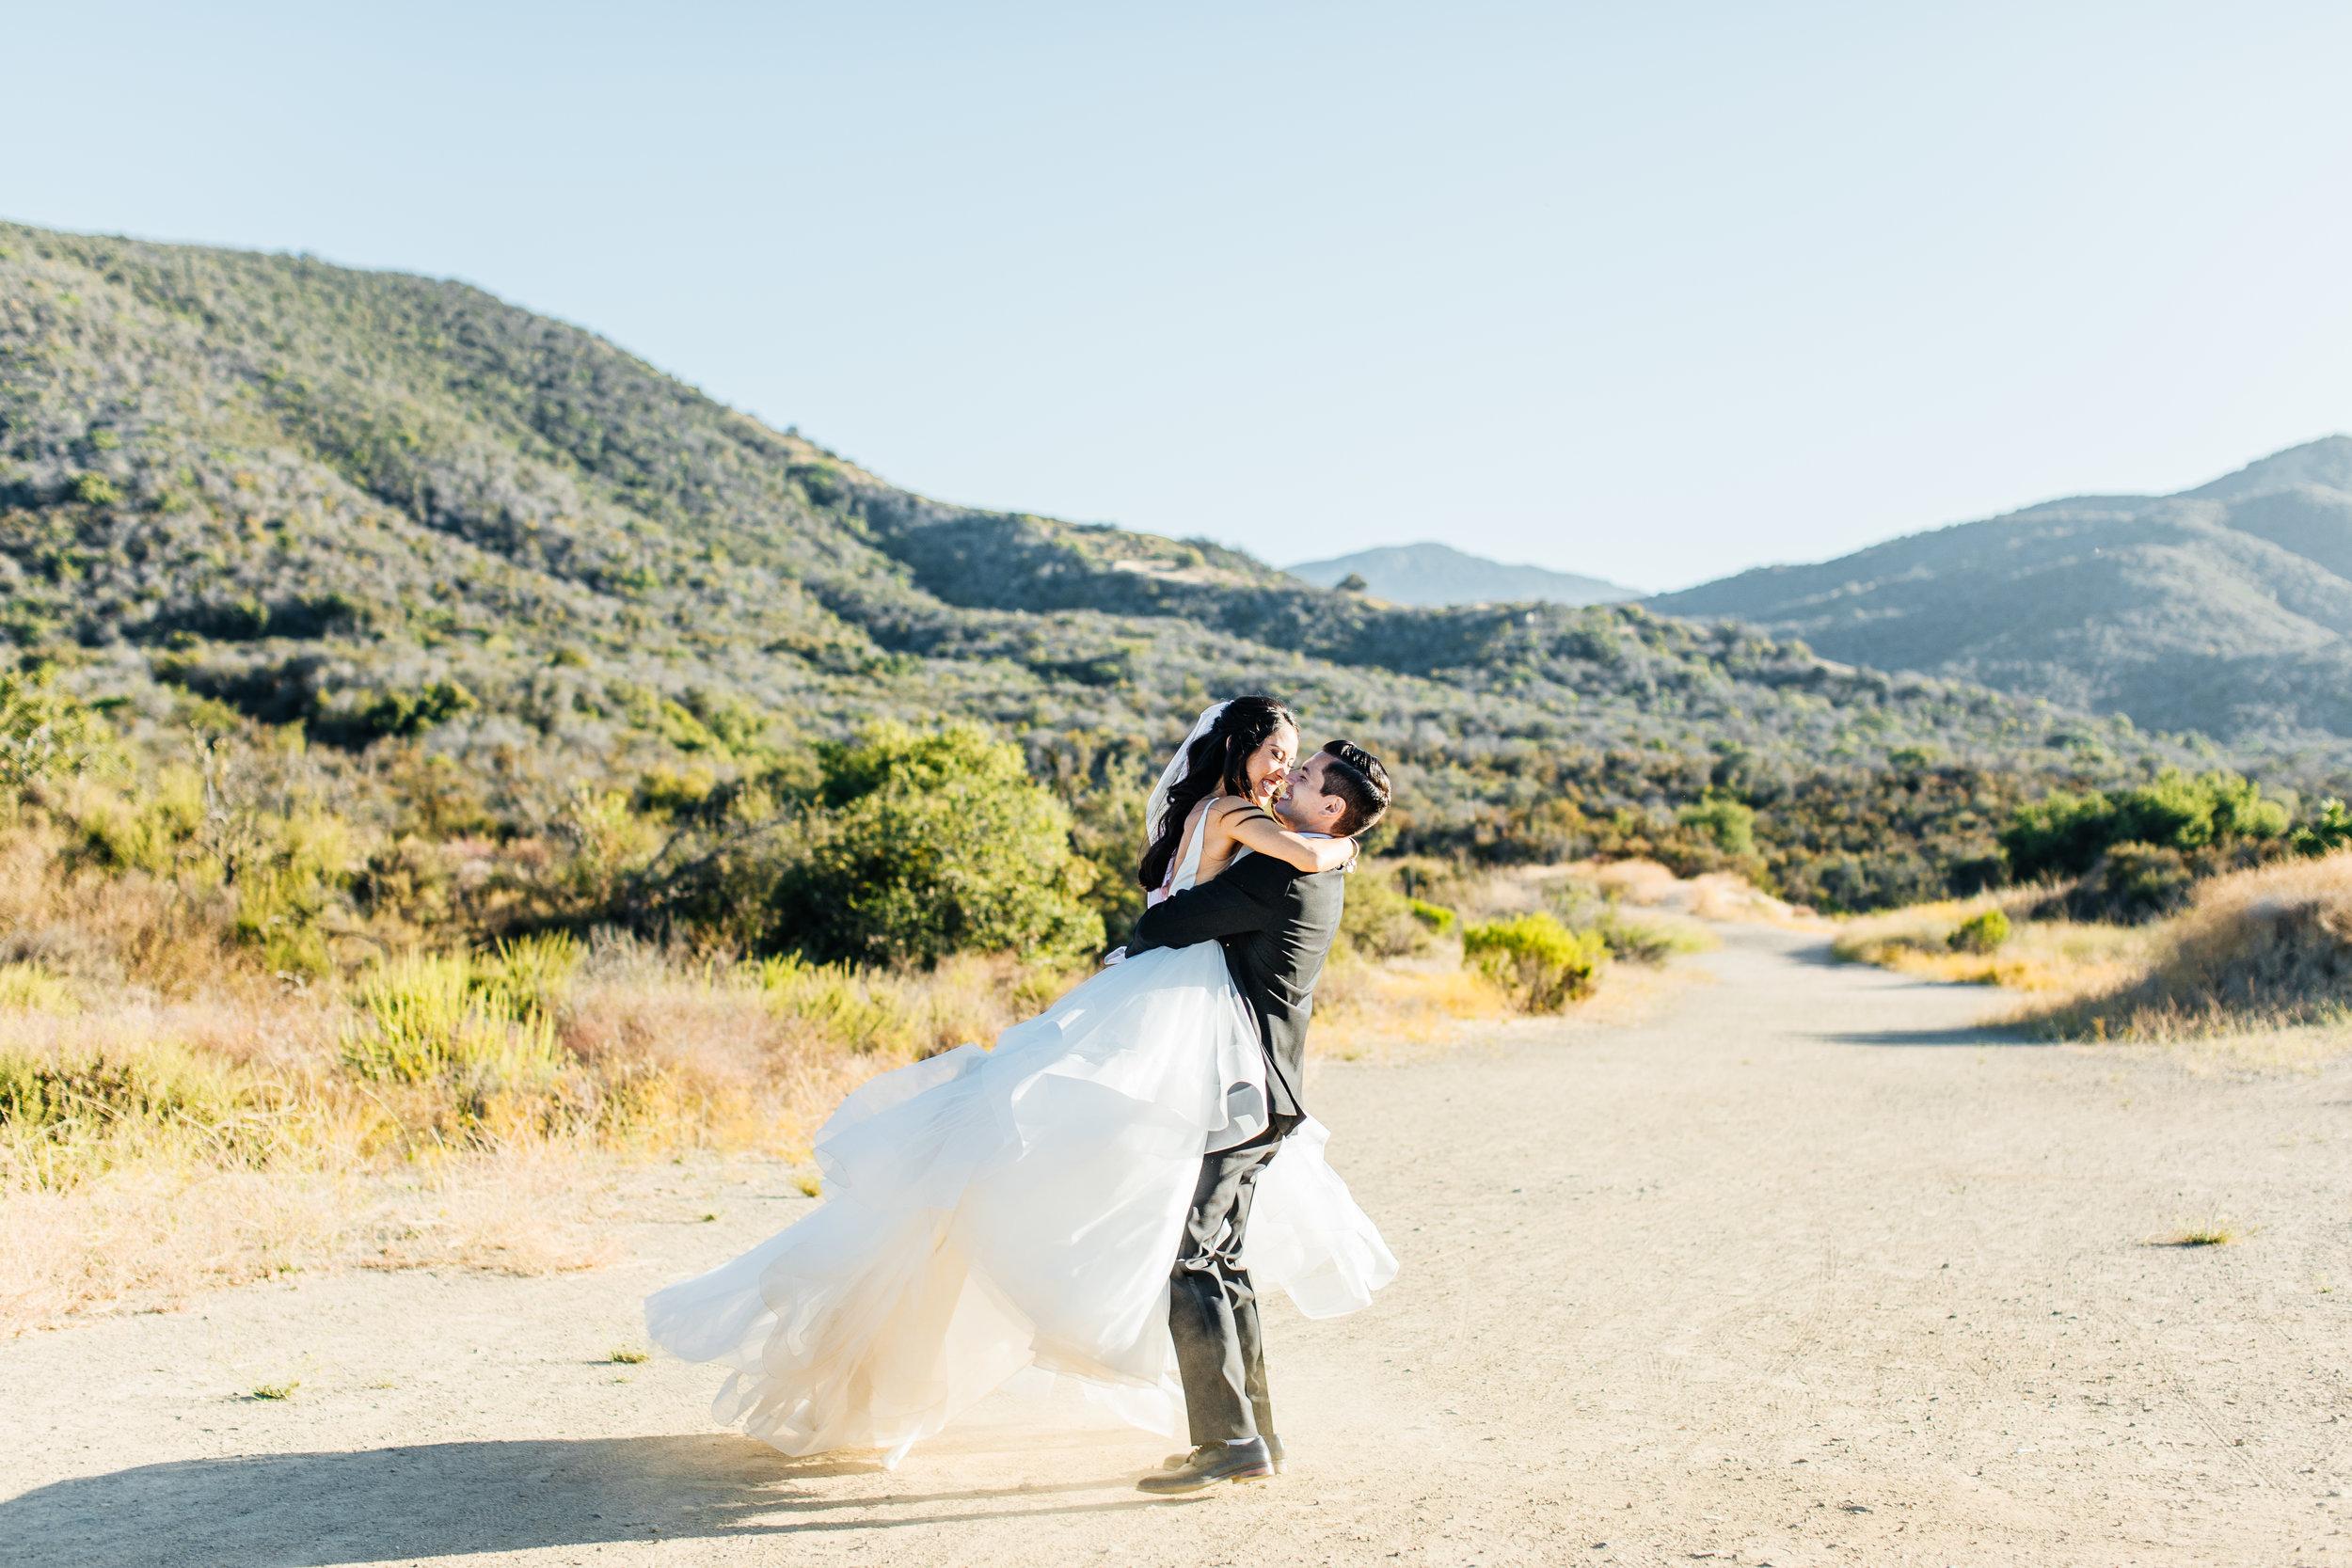 Alex + Joe's Wedding | Second Shot for Clarisse-179.jpg